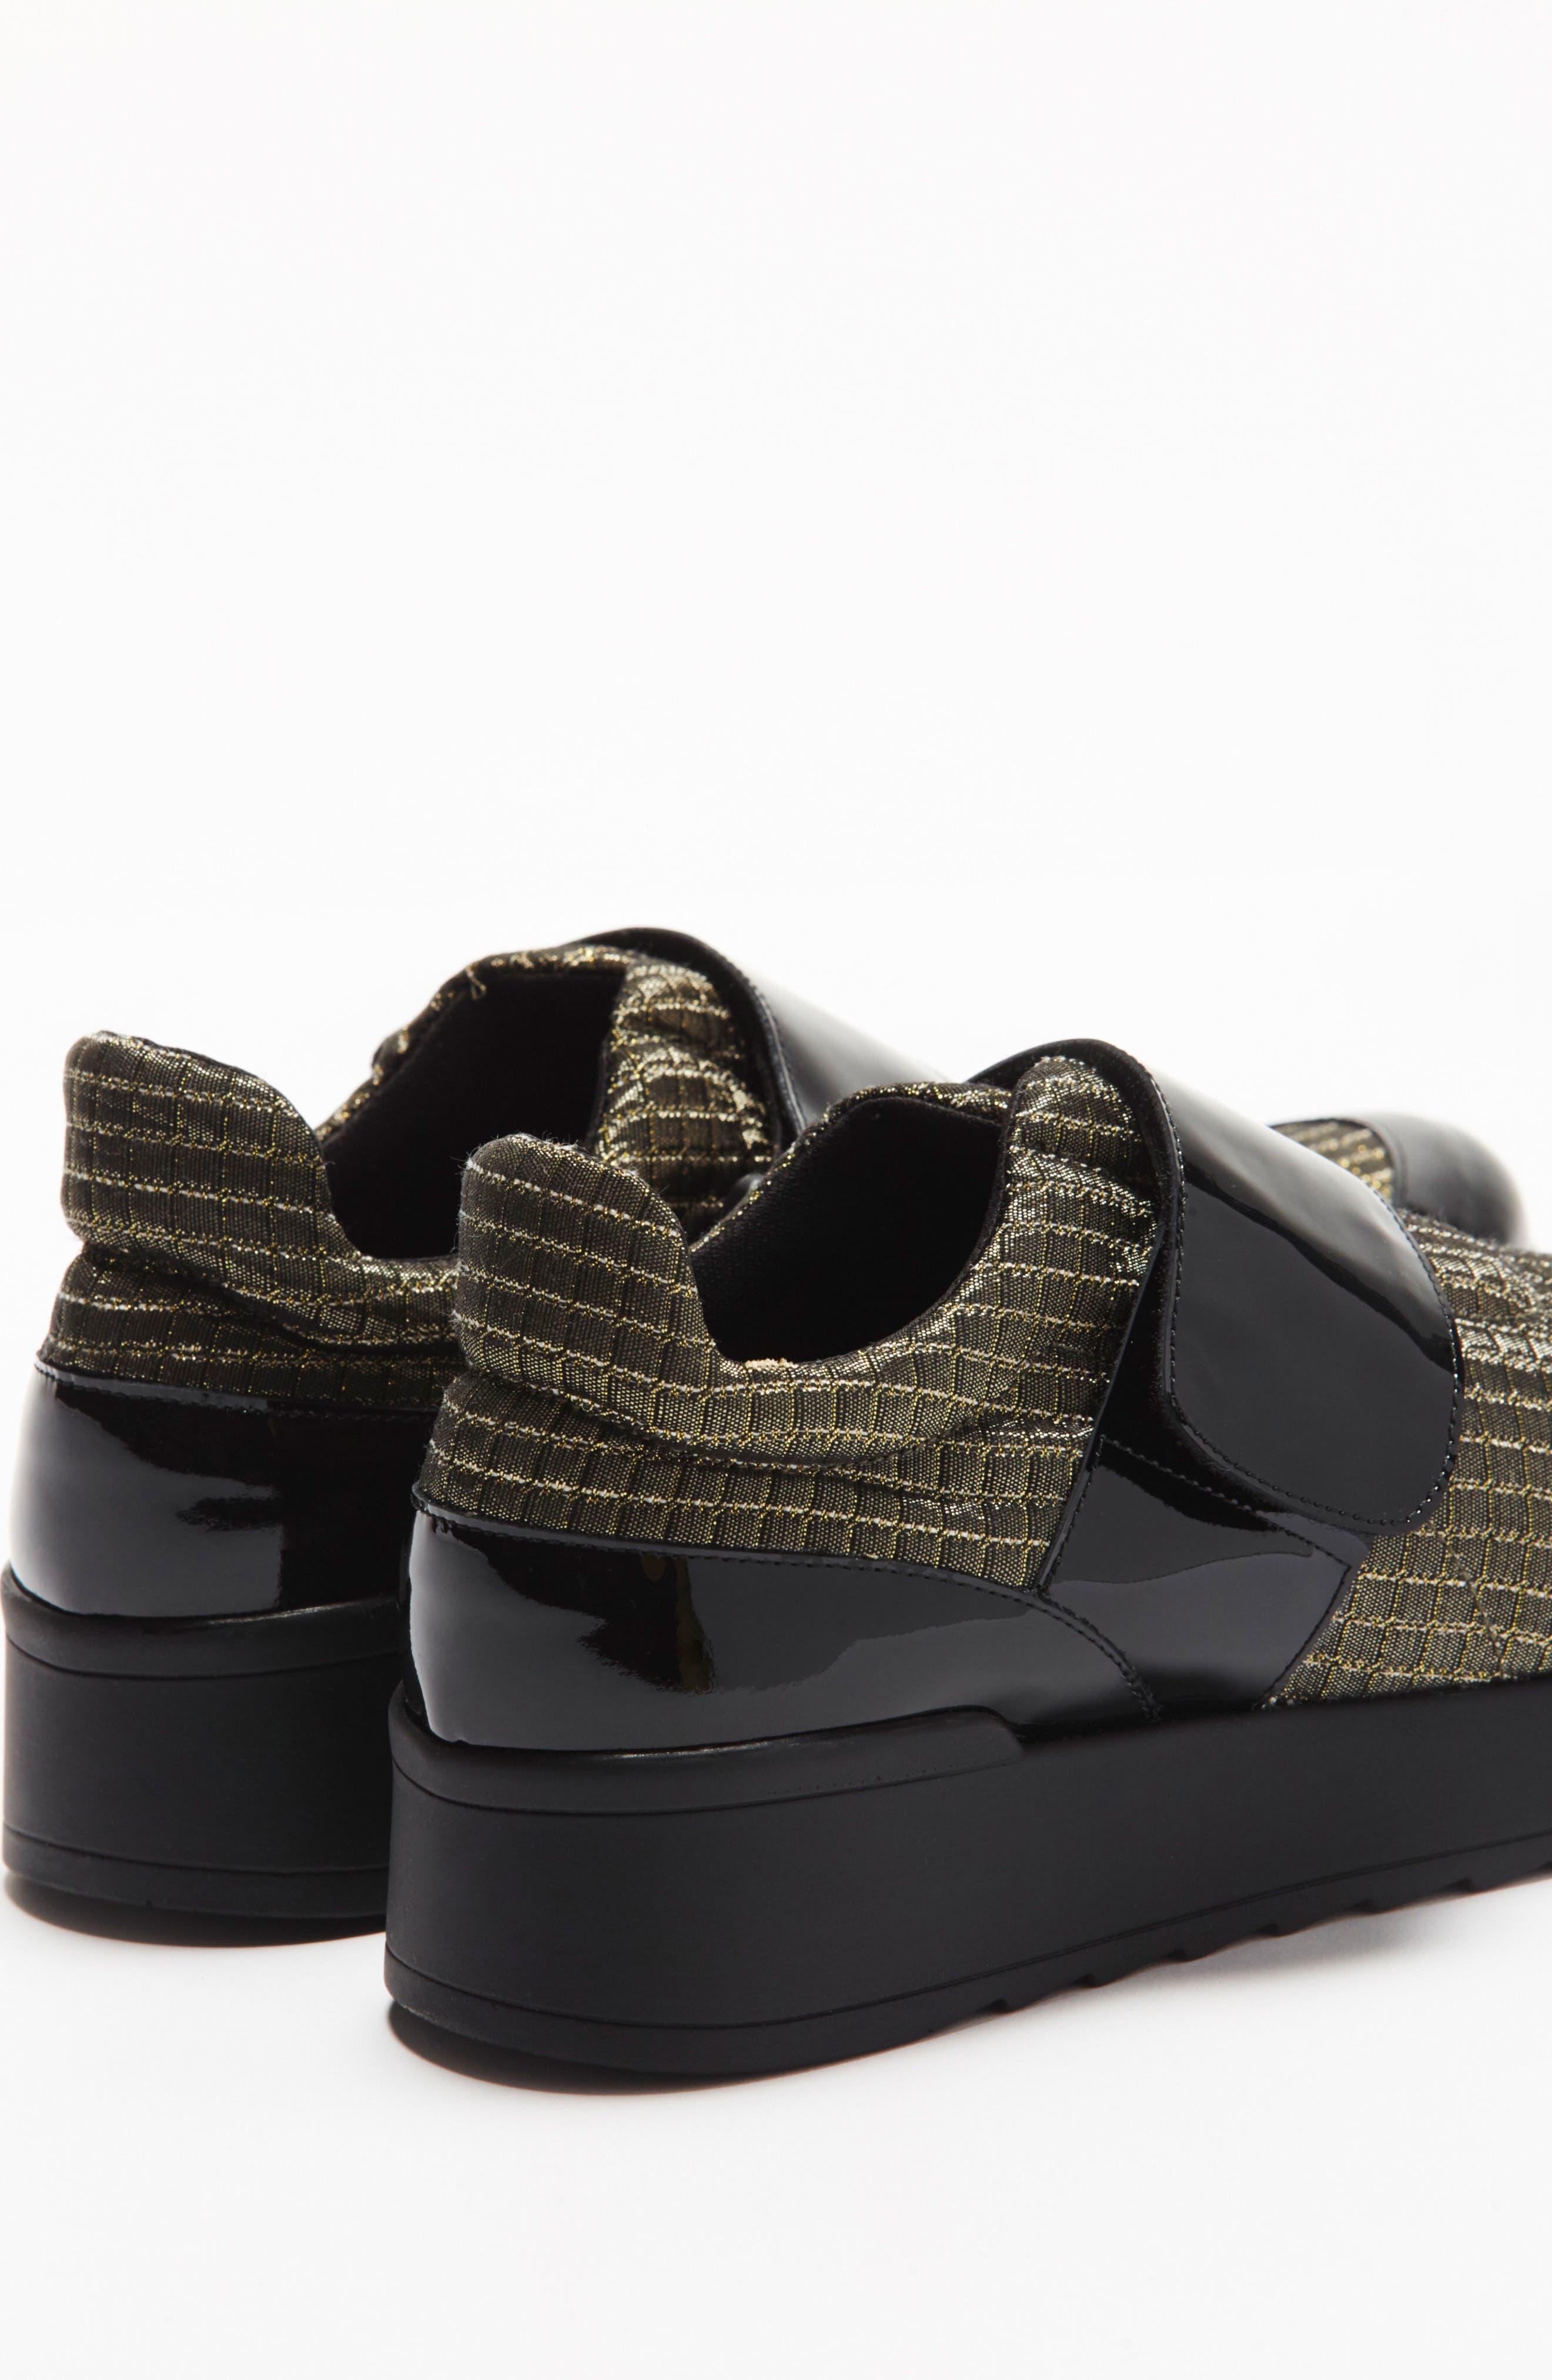 Cannon Sneaker,                             Alternate thumbnail 7, color,                             001